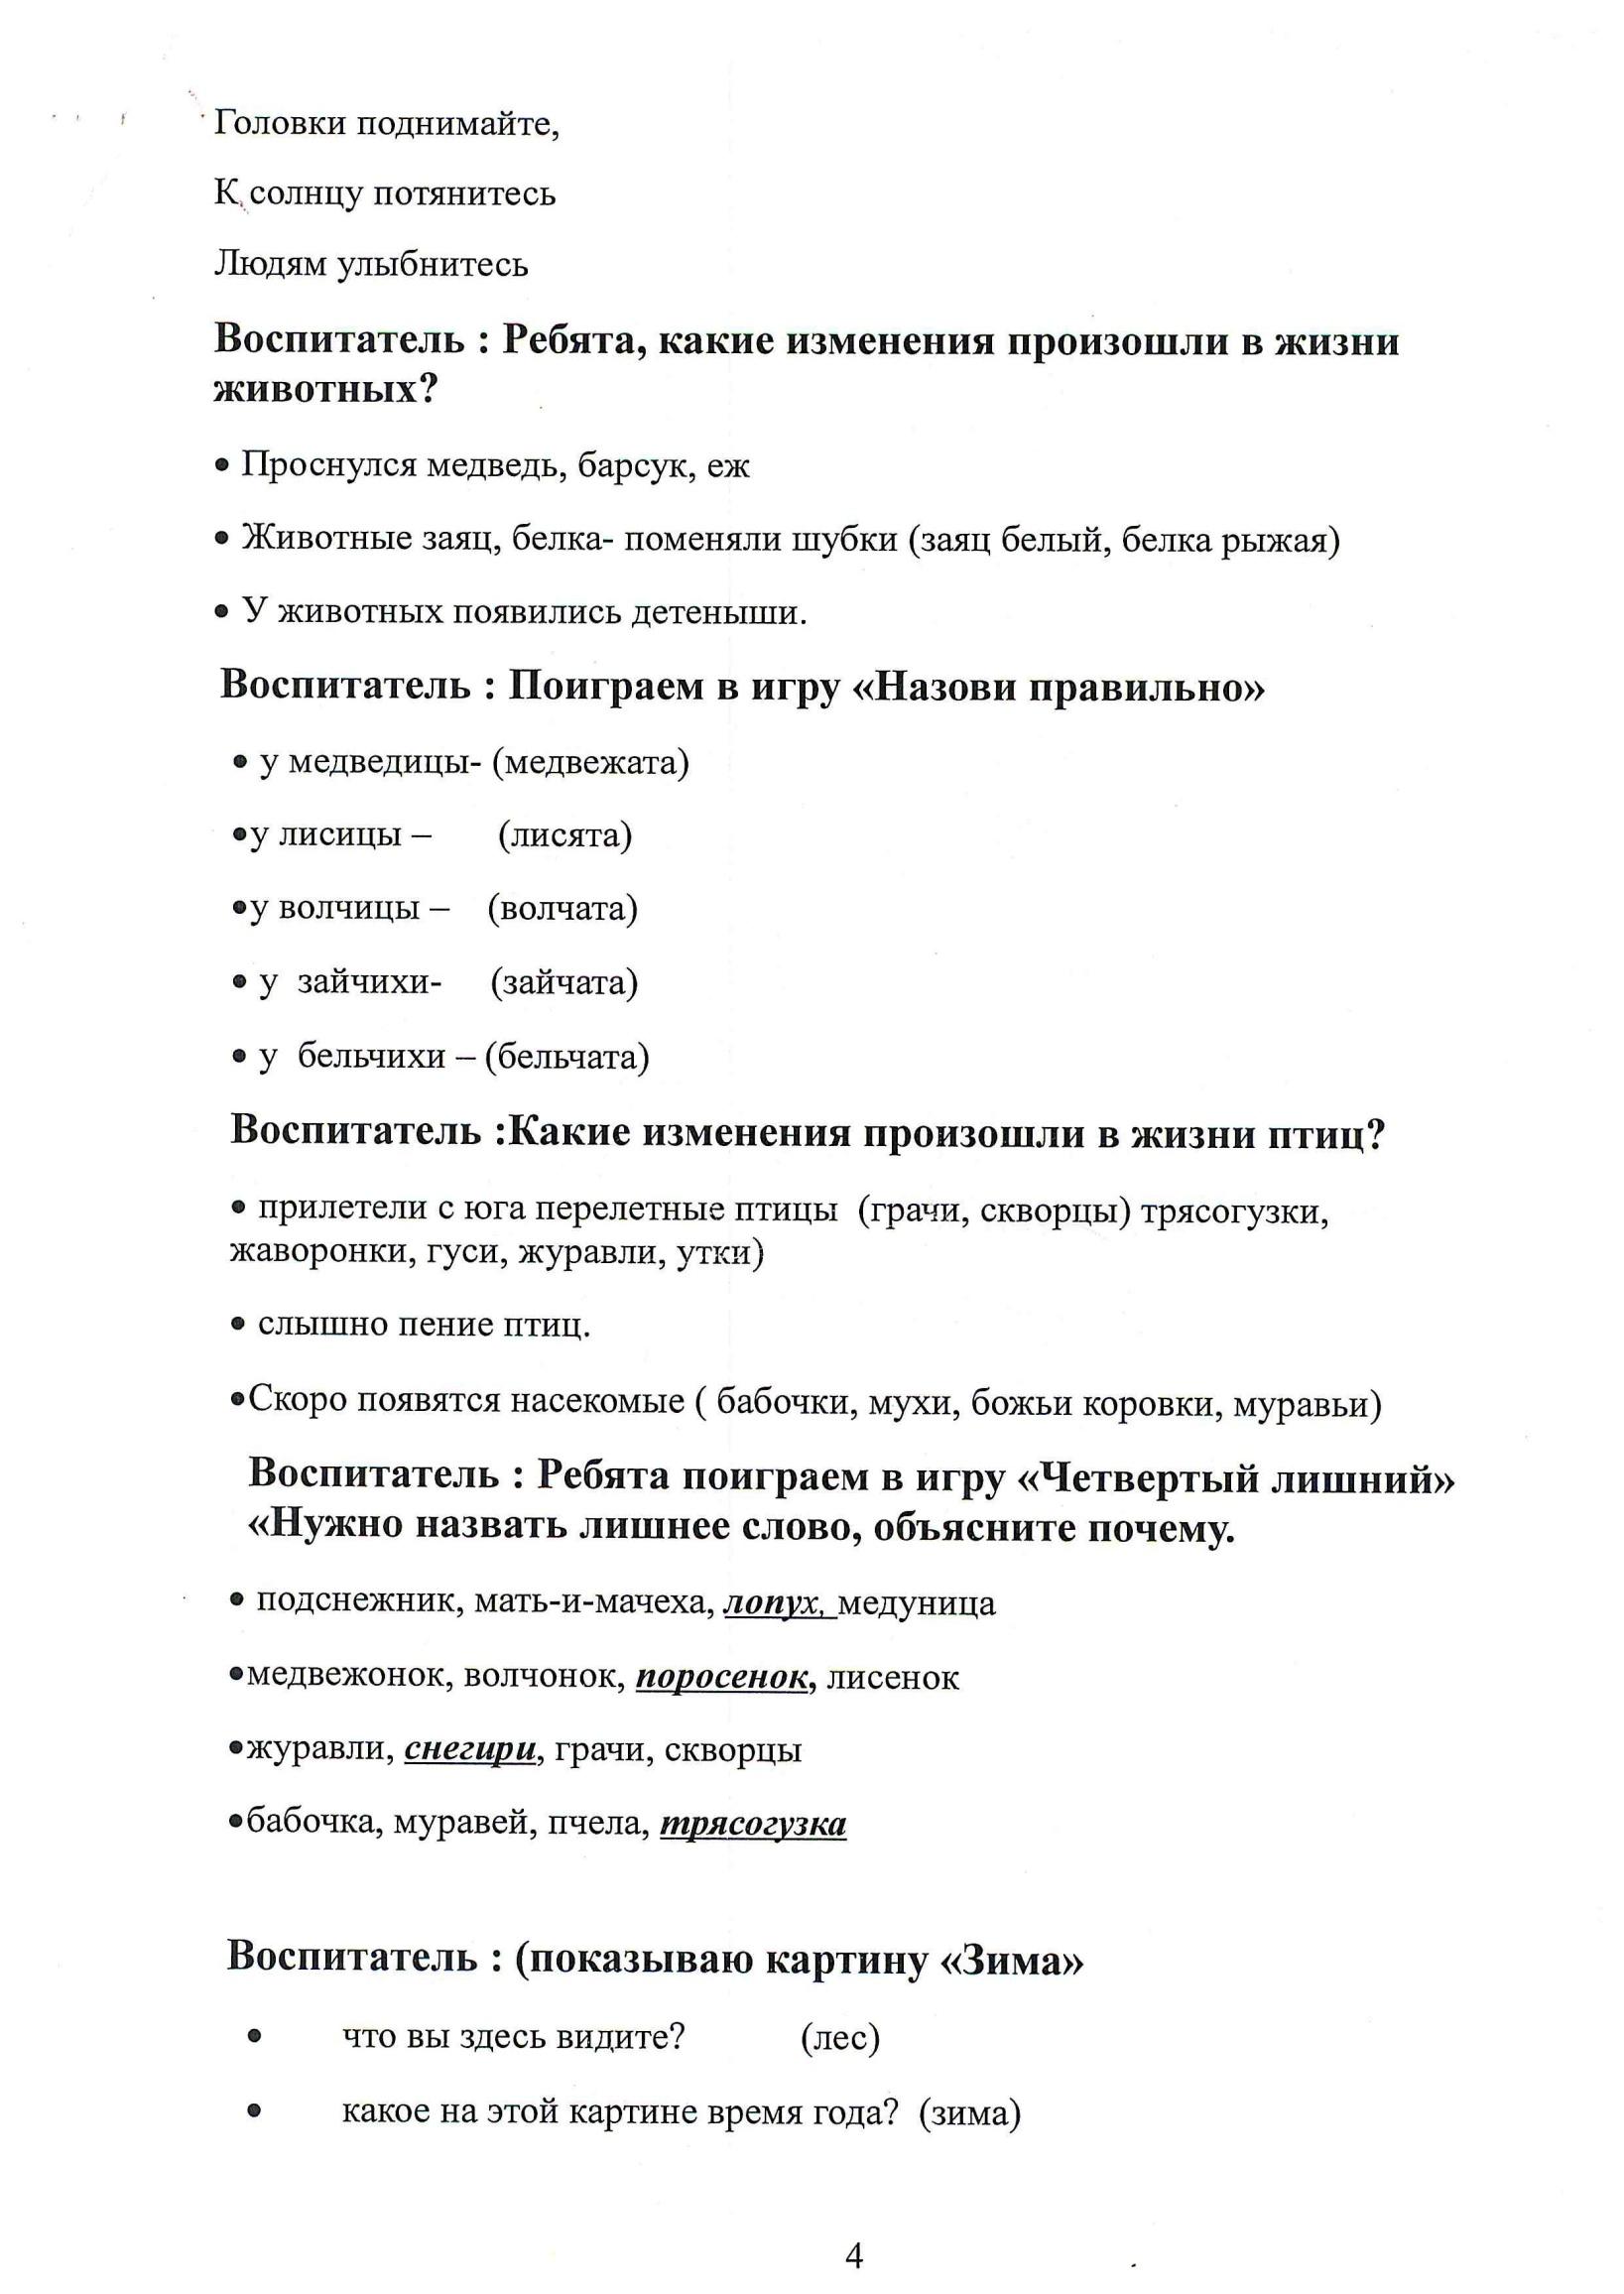 F:\Скан\doc03531820160107130539_004.jpg